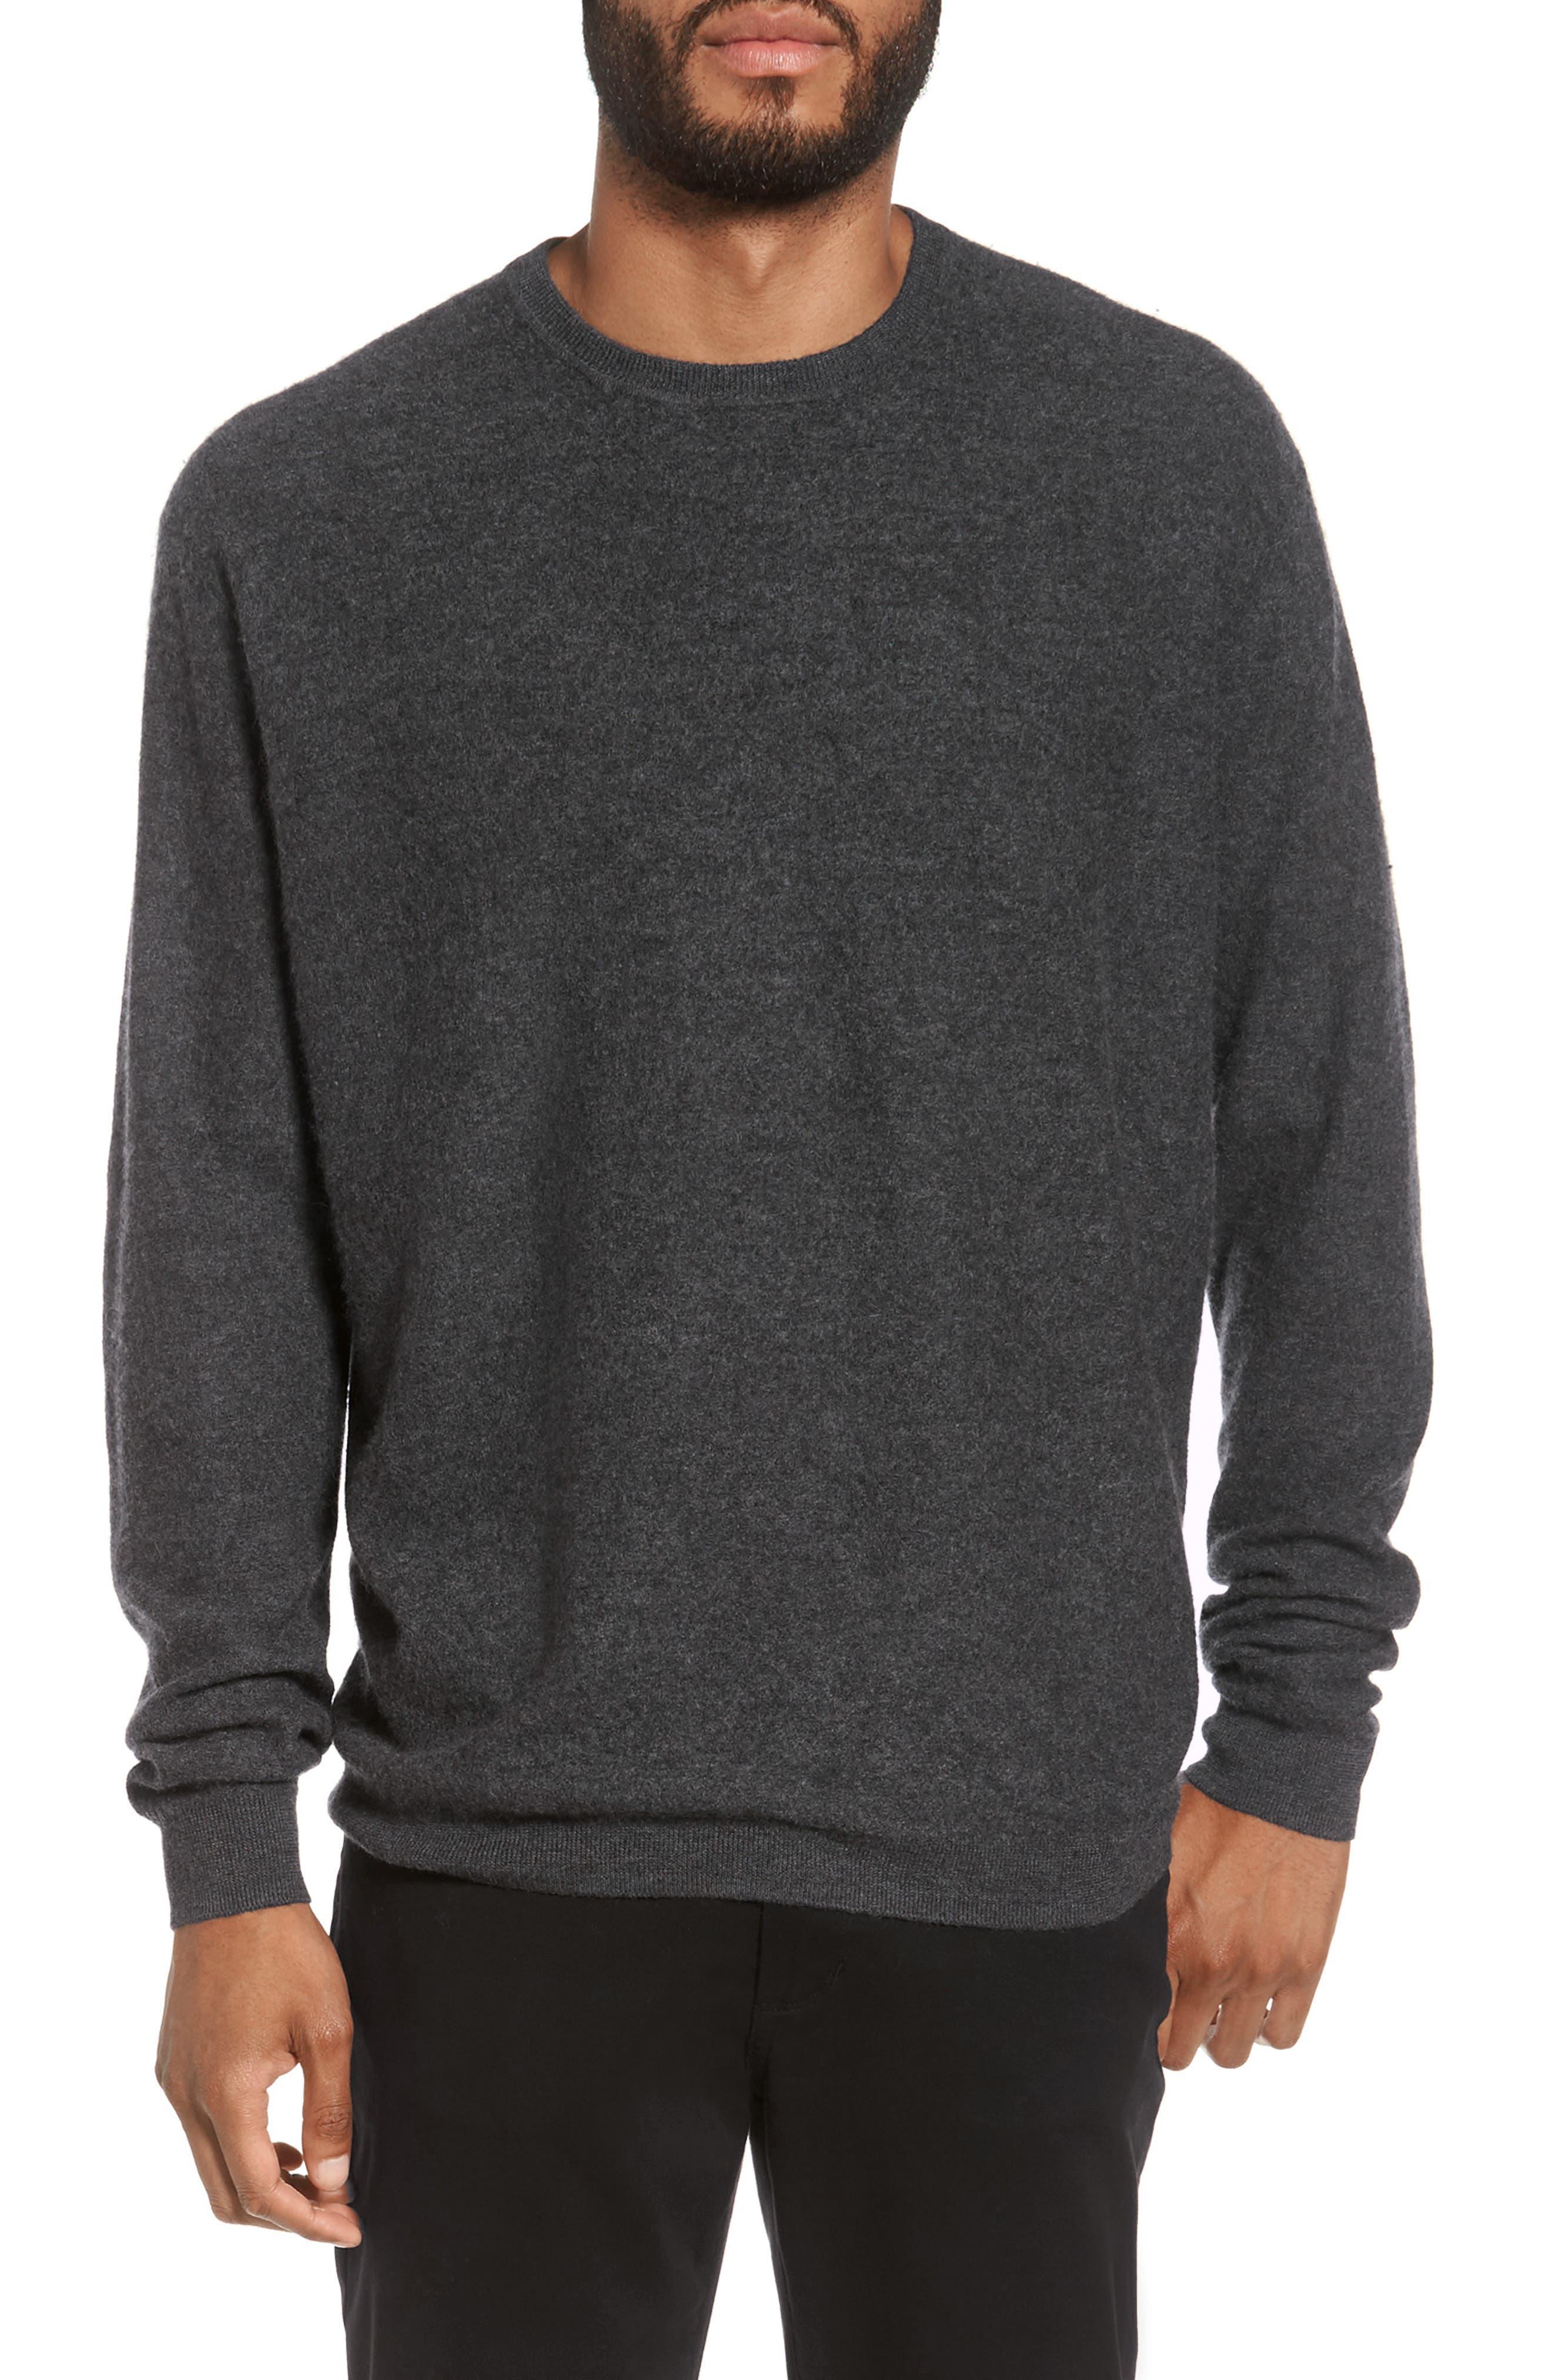 Main Image - Vince Cashmere Crewneck Sweater